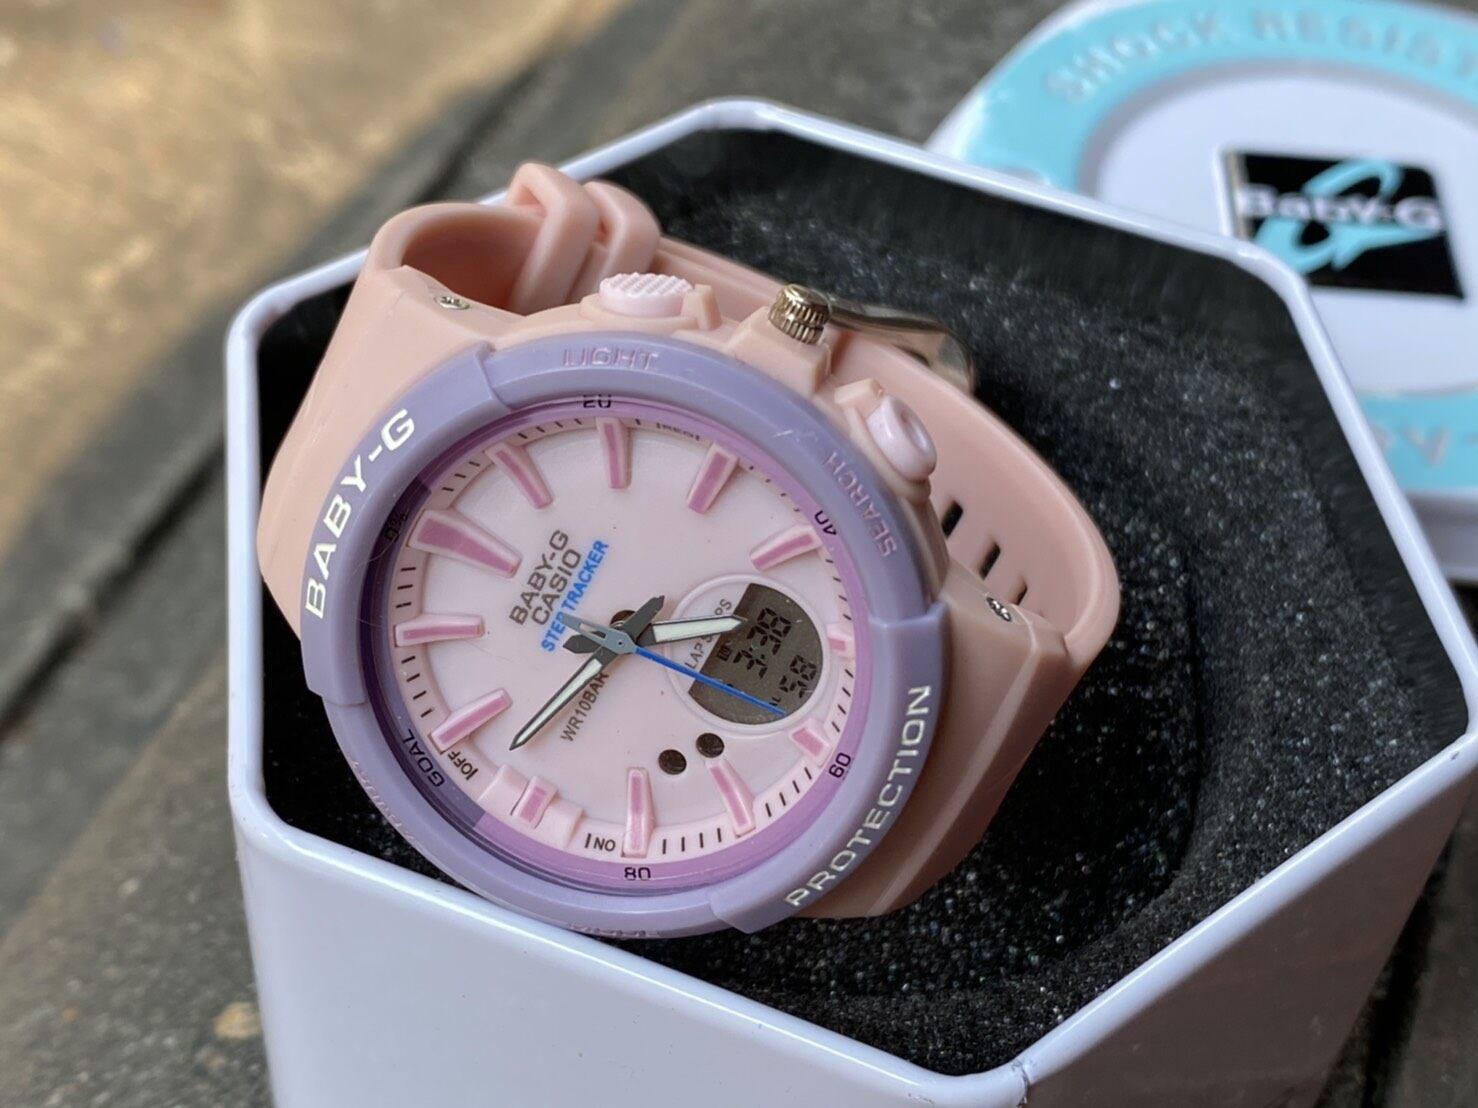 T-Time นาฬิกาดิจิตอลสีพาสเทล พร้อมกล่องคาสิโอ้.